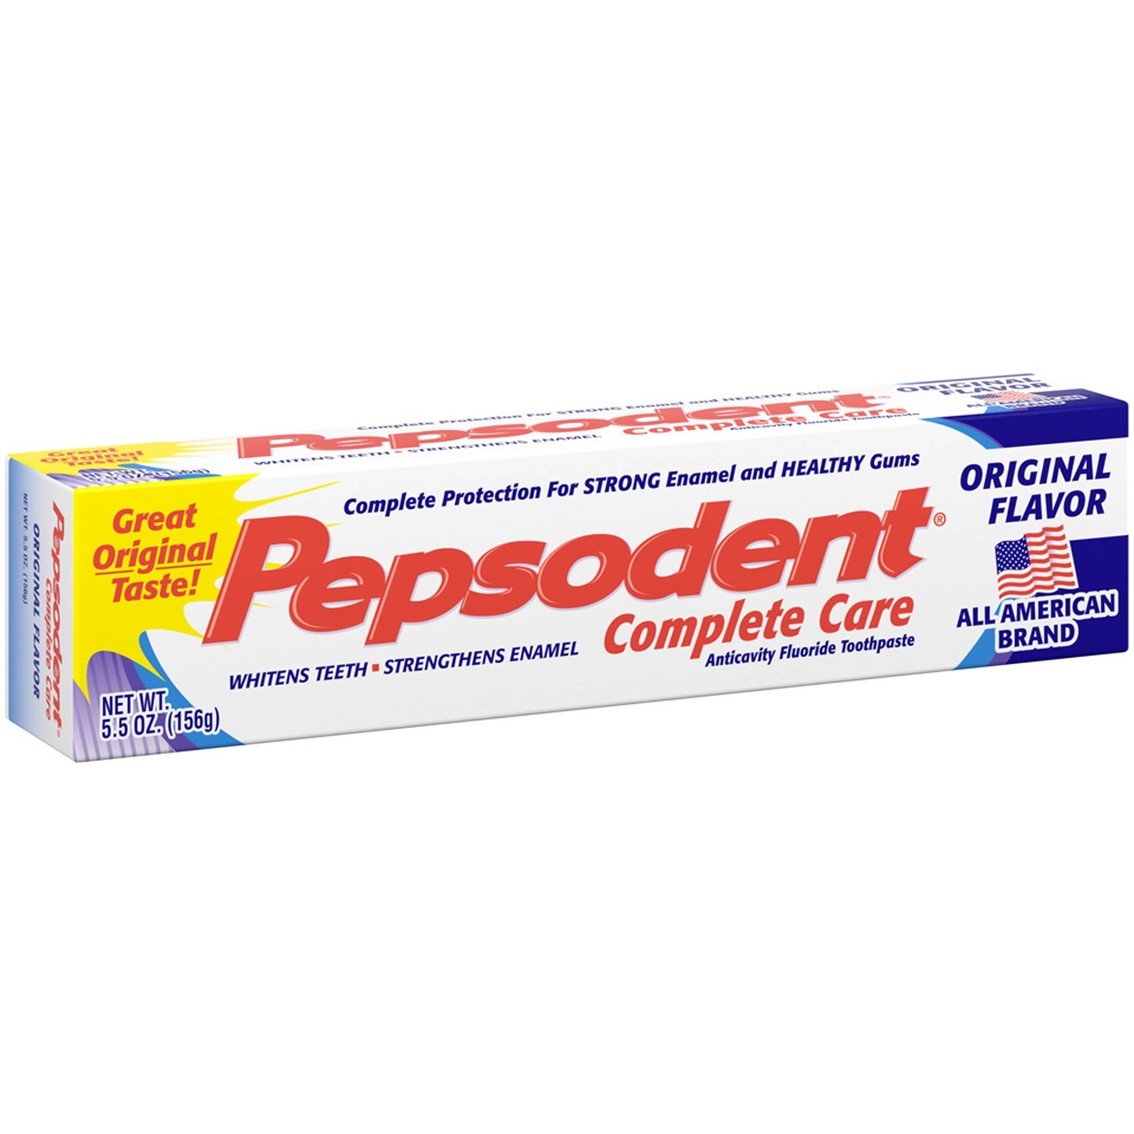 Pepsodent Complete Care Anti-cavity Original Flavor Fluoride